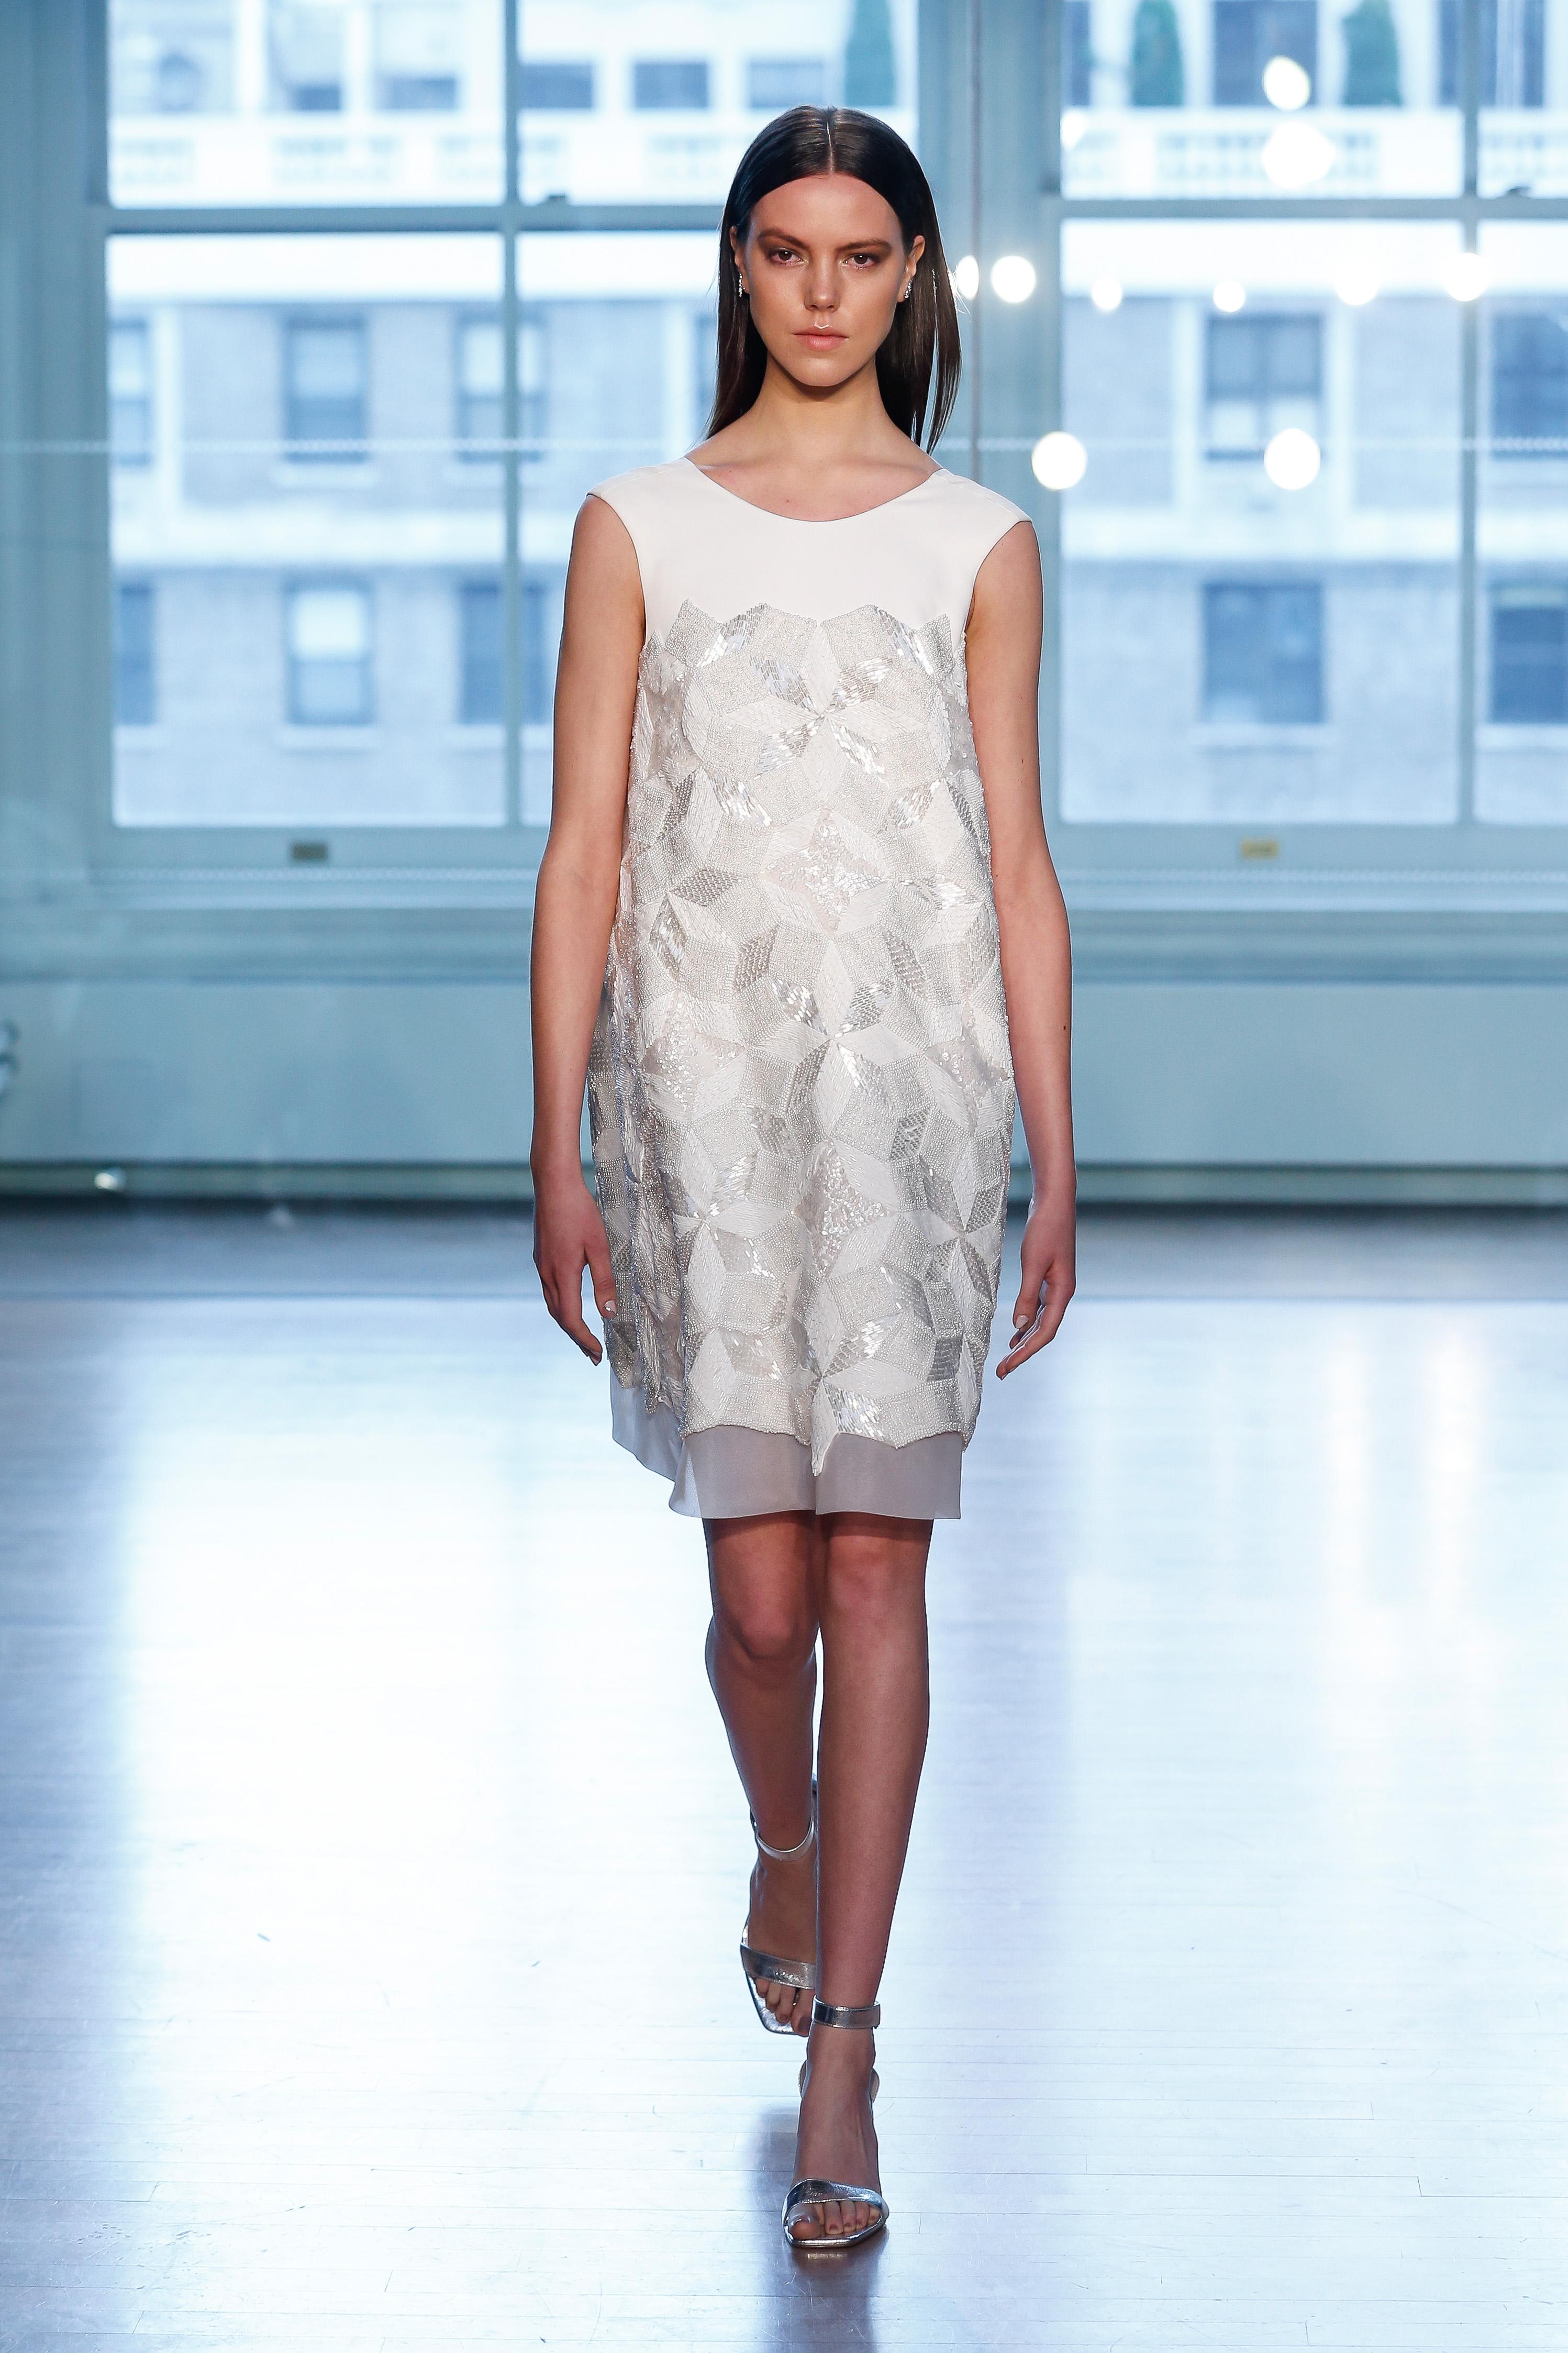 justin alexander wedding dress spring 2019 short column sleeveless